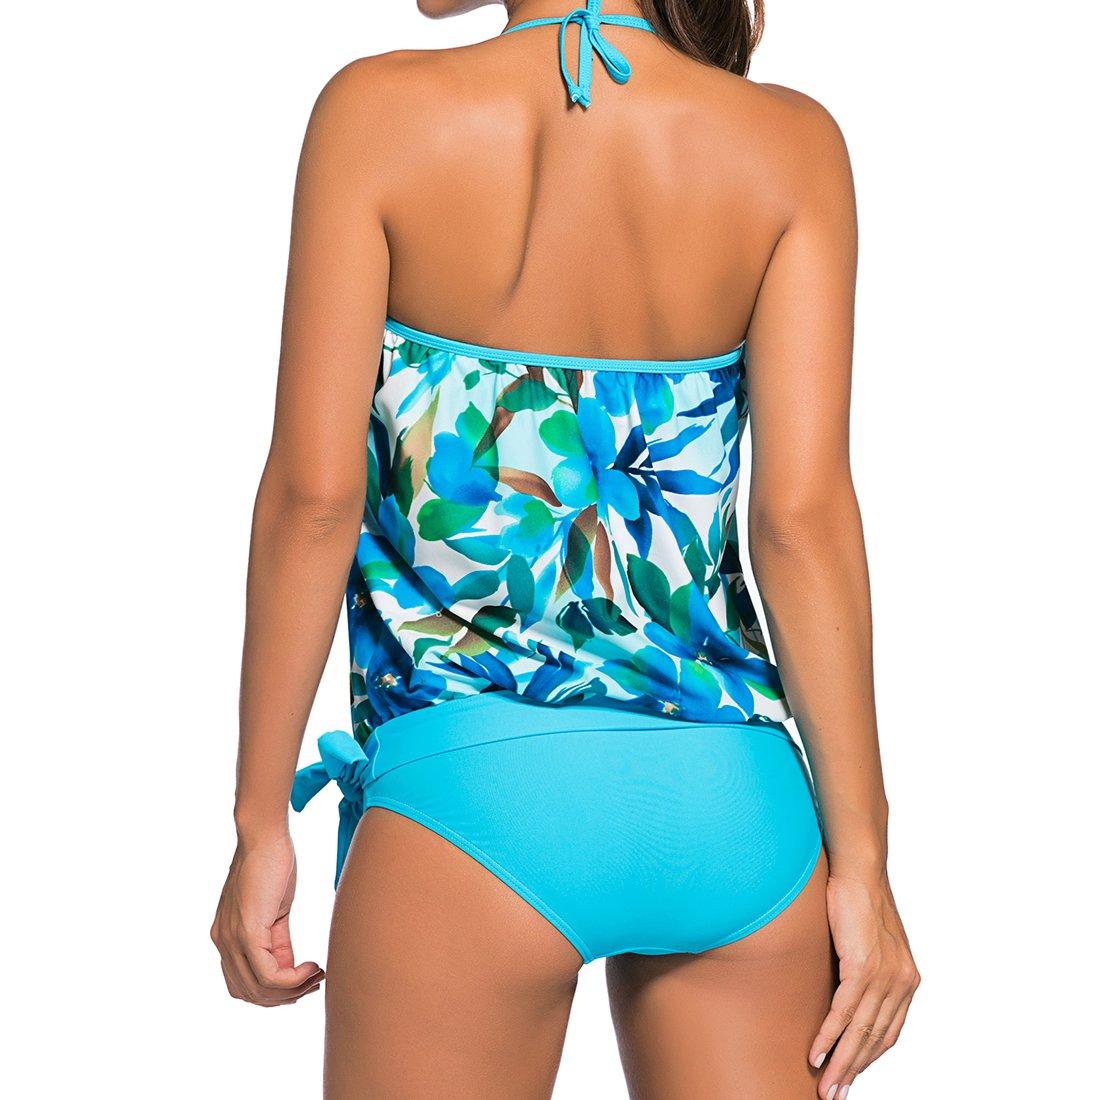 Dissa HT41923 Women Noir Swimsuit 1 Piece Tankini,EU Size 38-40(M)